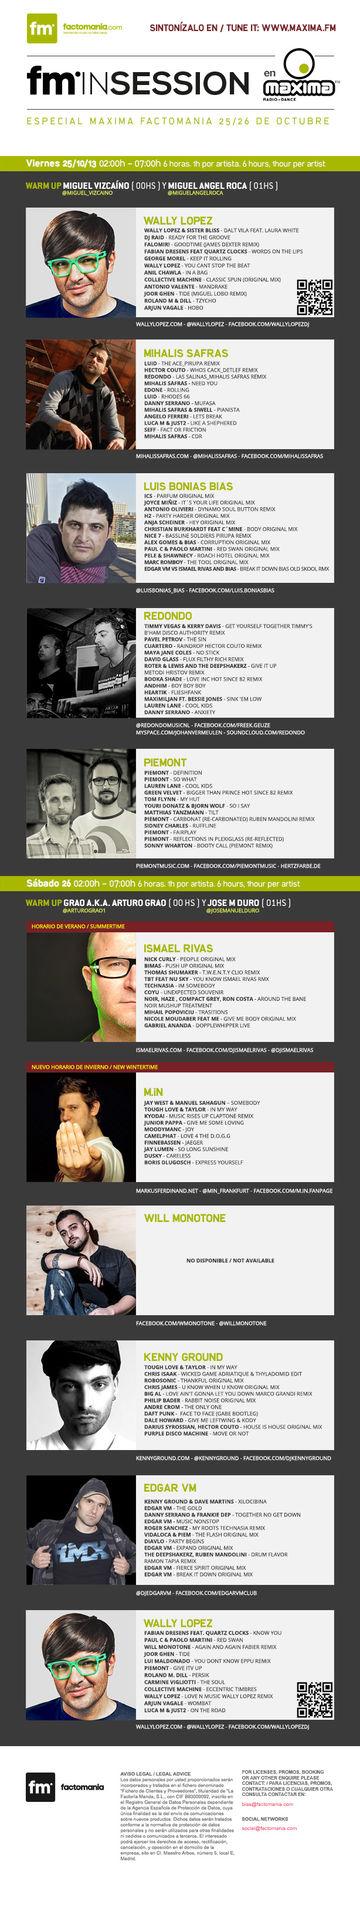 2013-10-2X - Especial Factomania Radioshow, Maxima FM.jpg